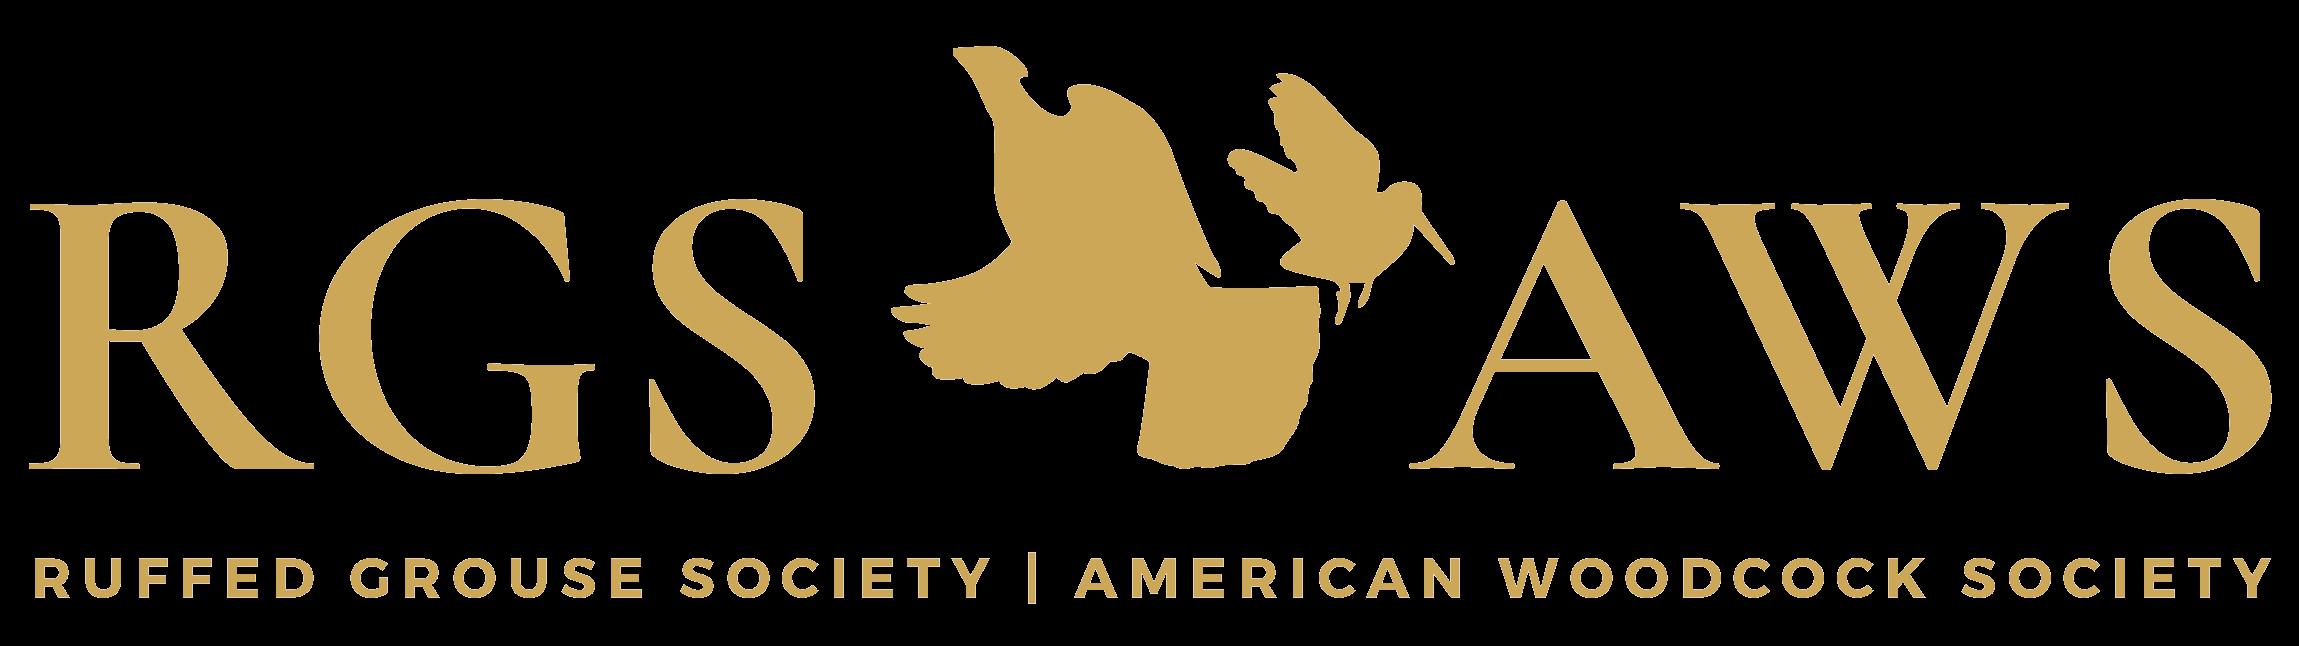 Ruffed Grouse Society | American Woodcock Society